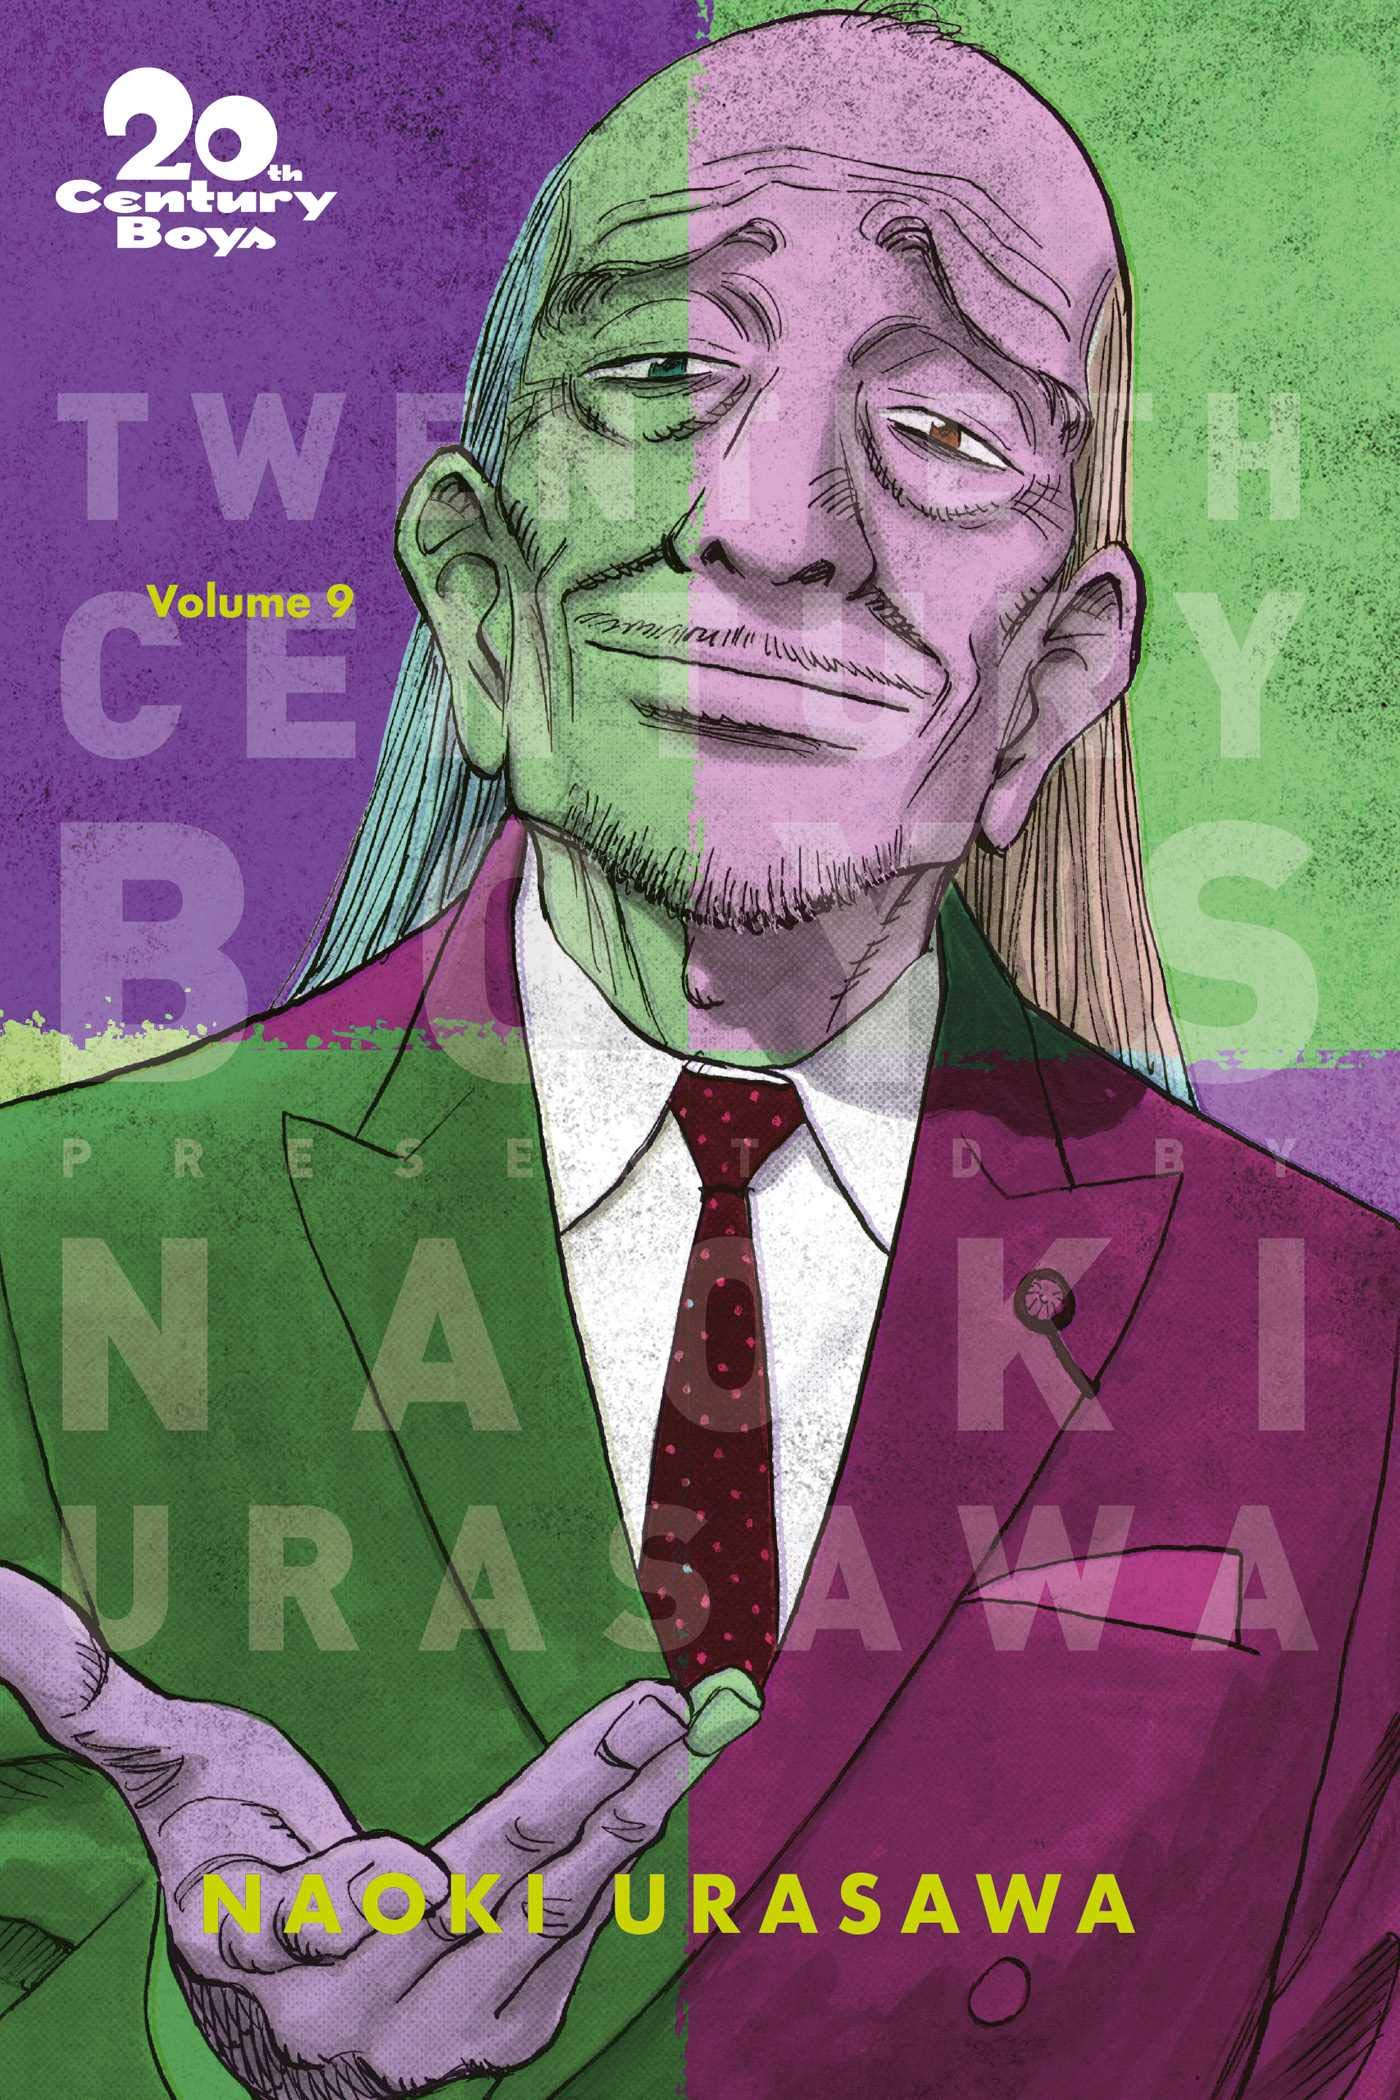 Amazon.fr - 20th Century Boys: The Perfect Edition, Vol. 9 - Urasawa, Naoki, Urasawa, Naoki - Livres